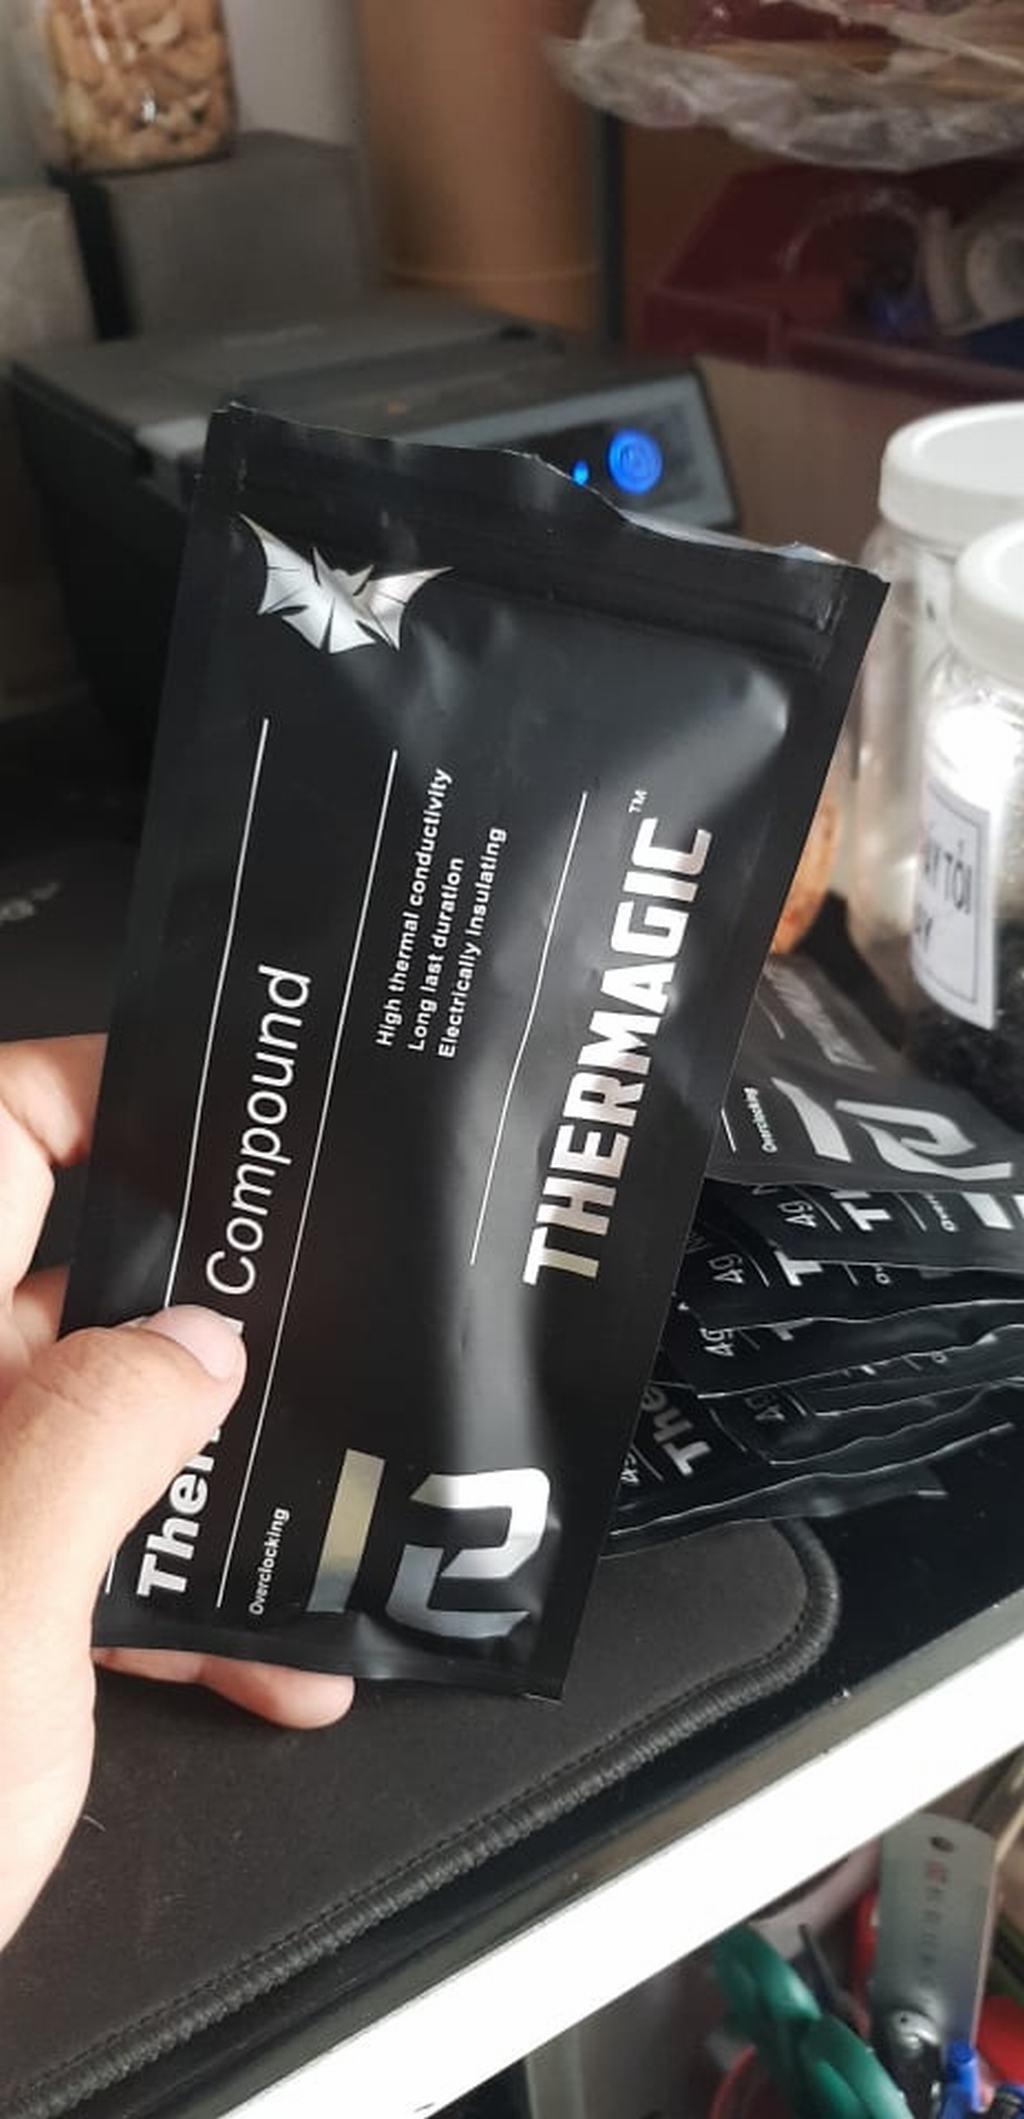 Keo tản nhiệt batman ZF12 12wmk 4grams